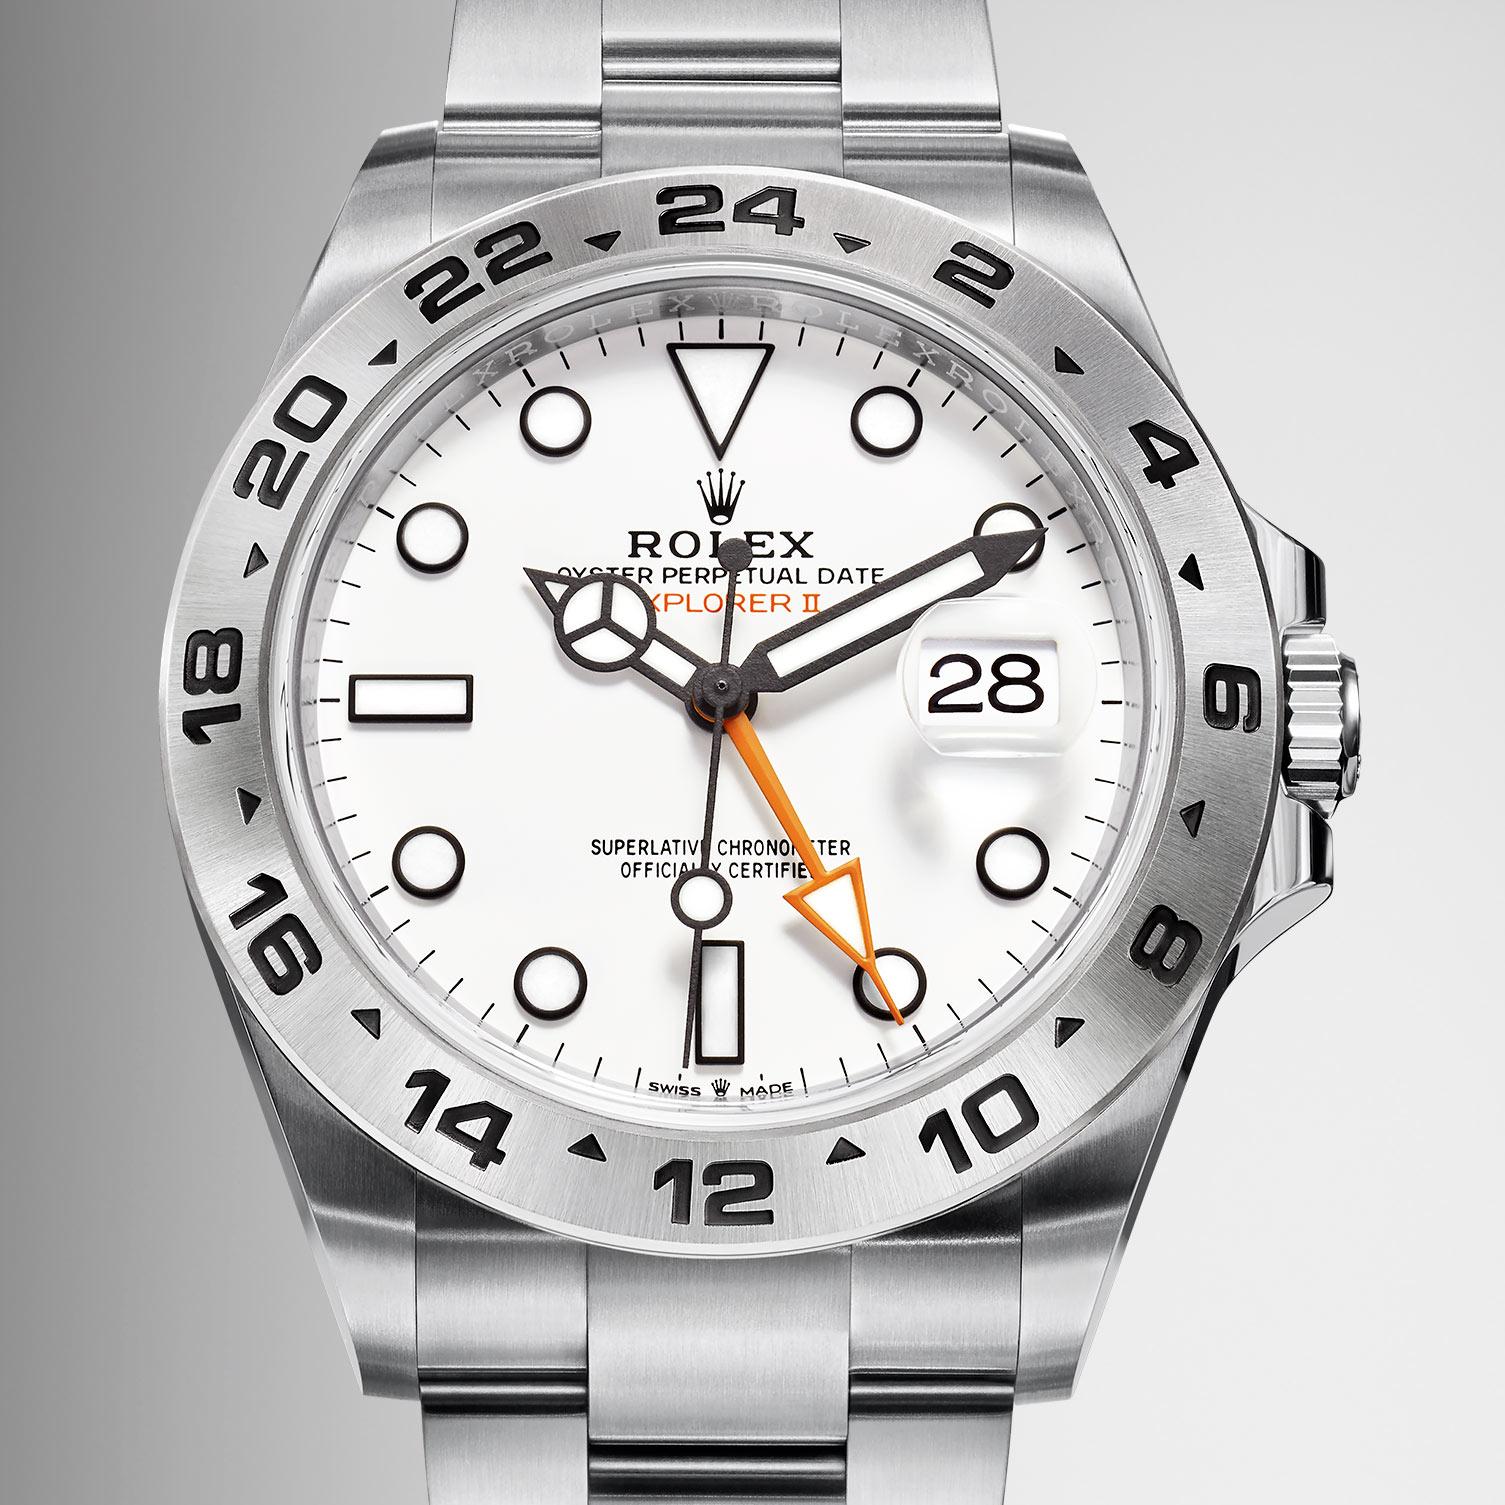 Explore the Rolex Collection